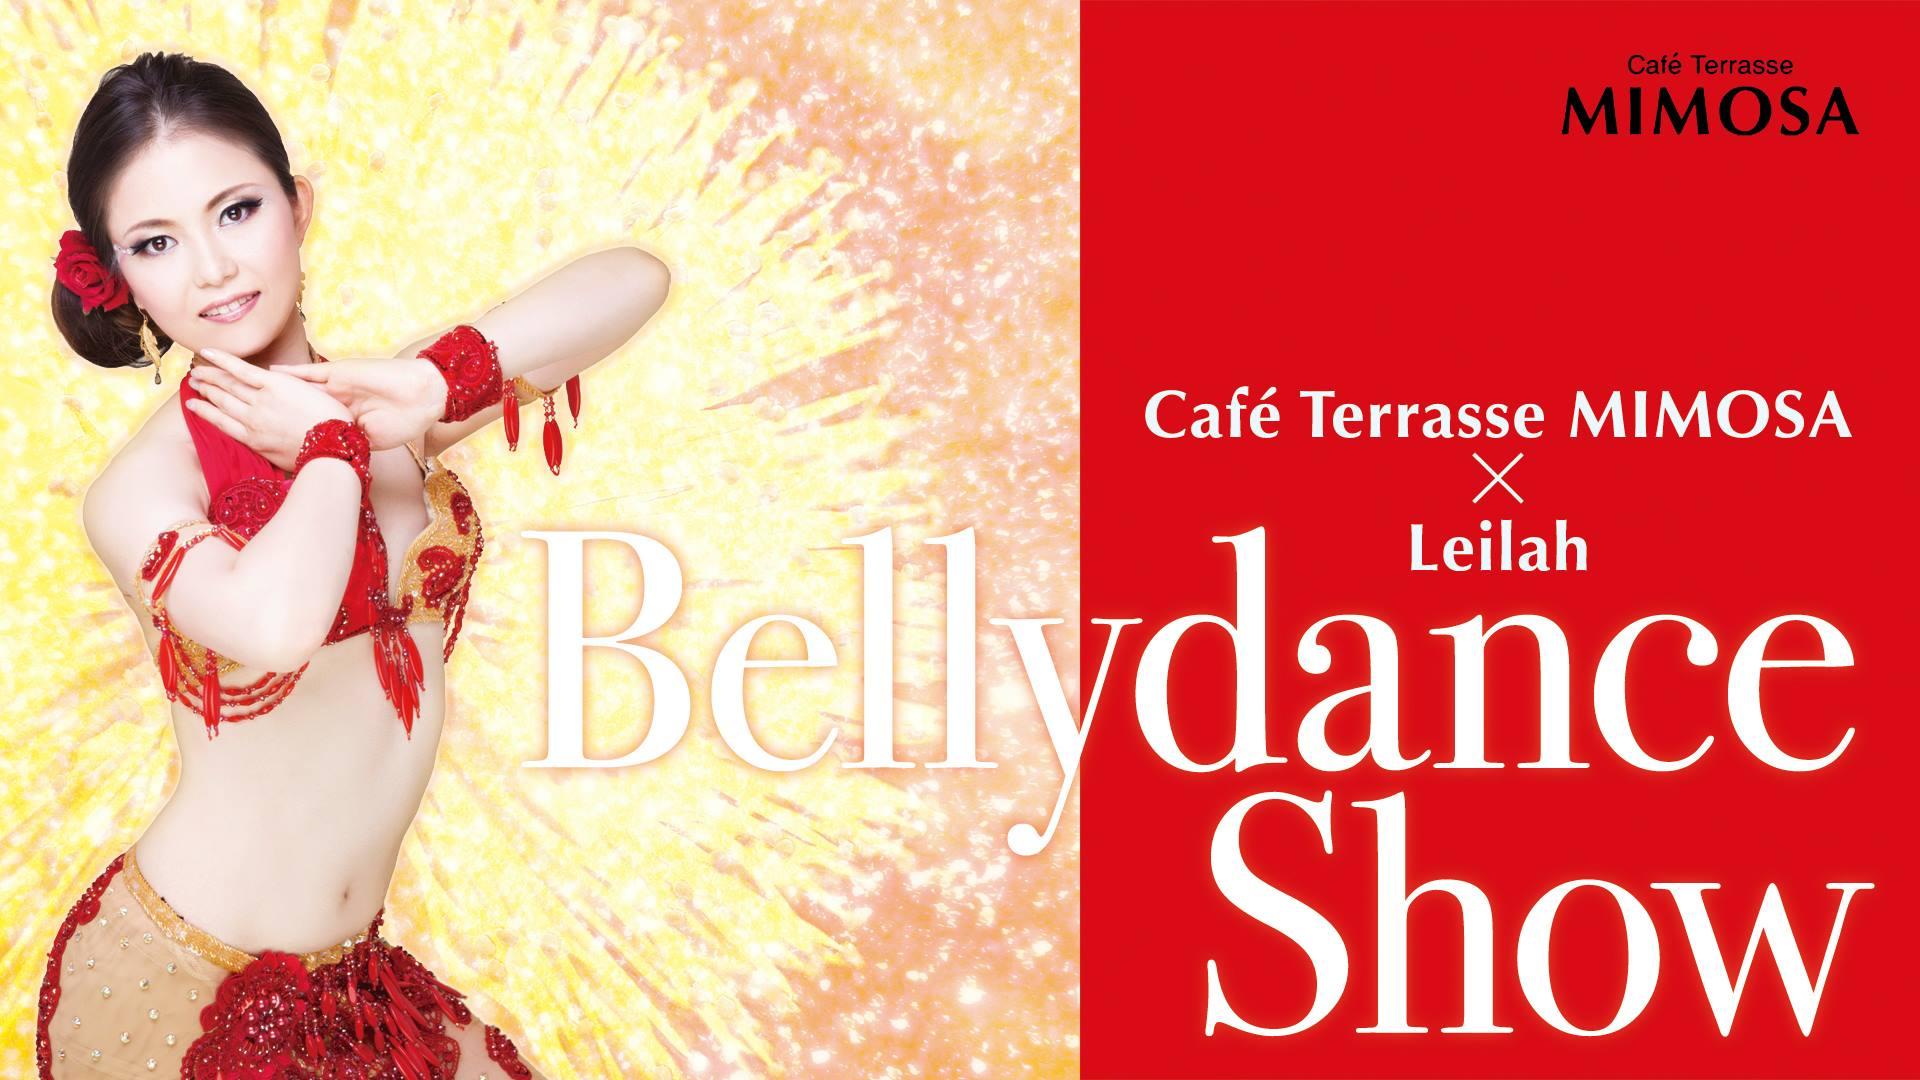 Café Terrasse MIMOSA × Leilah Bellydance Show vol.1 ✾3/1火